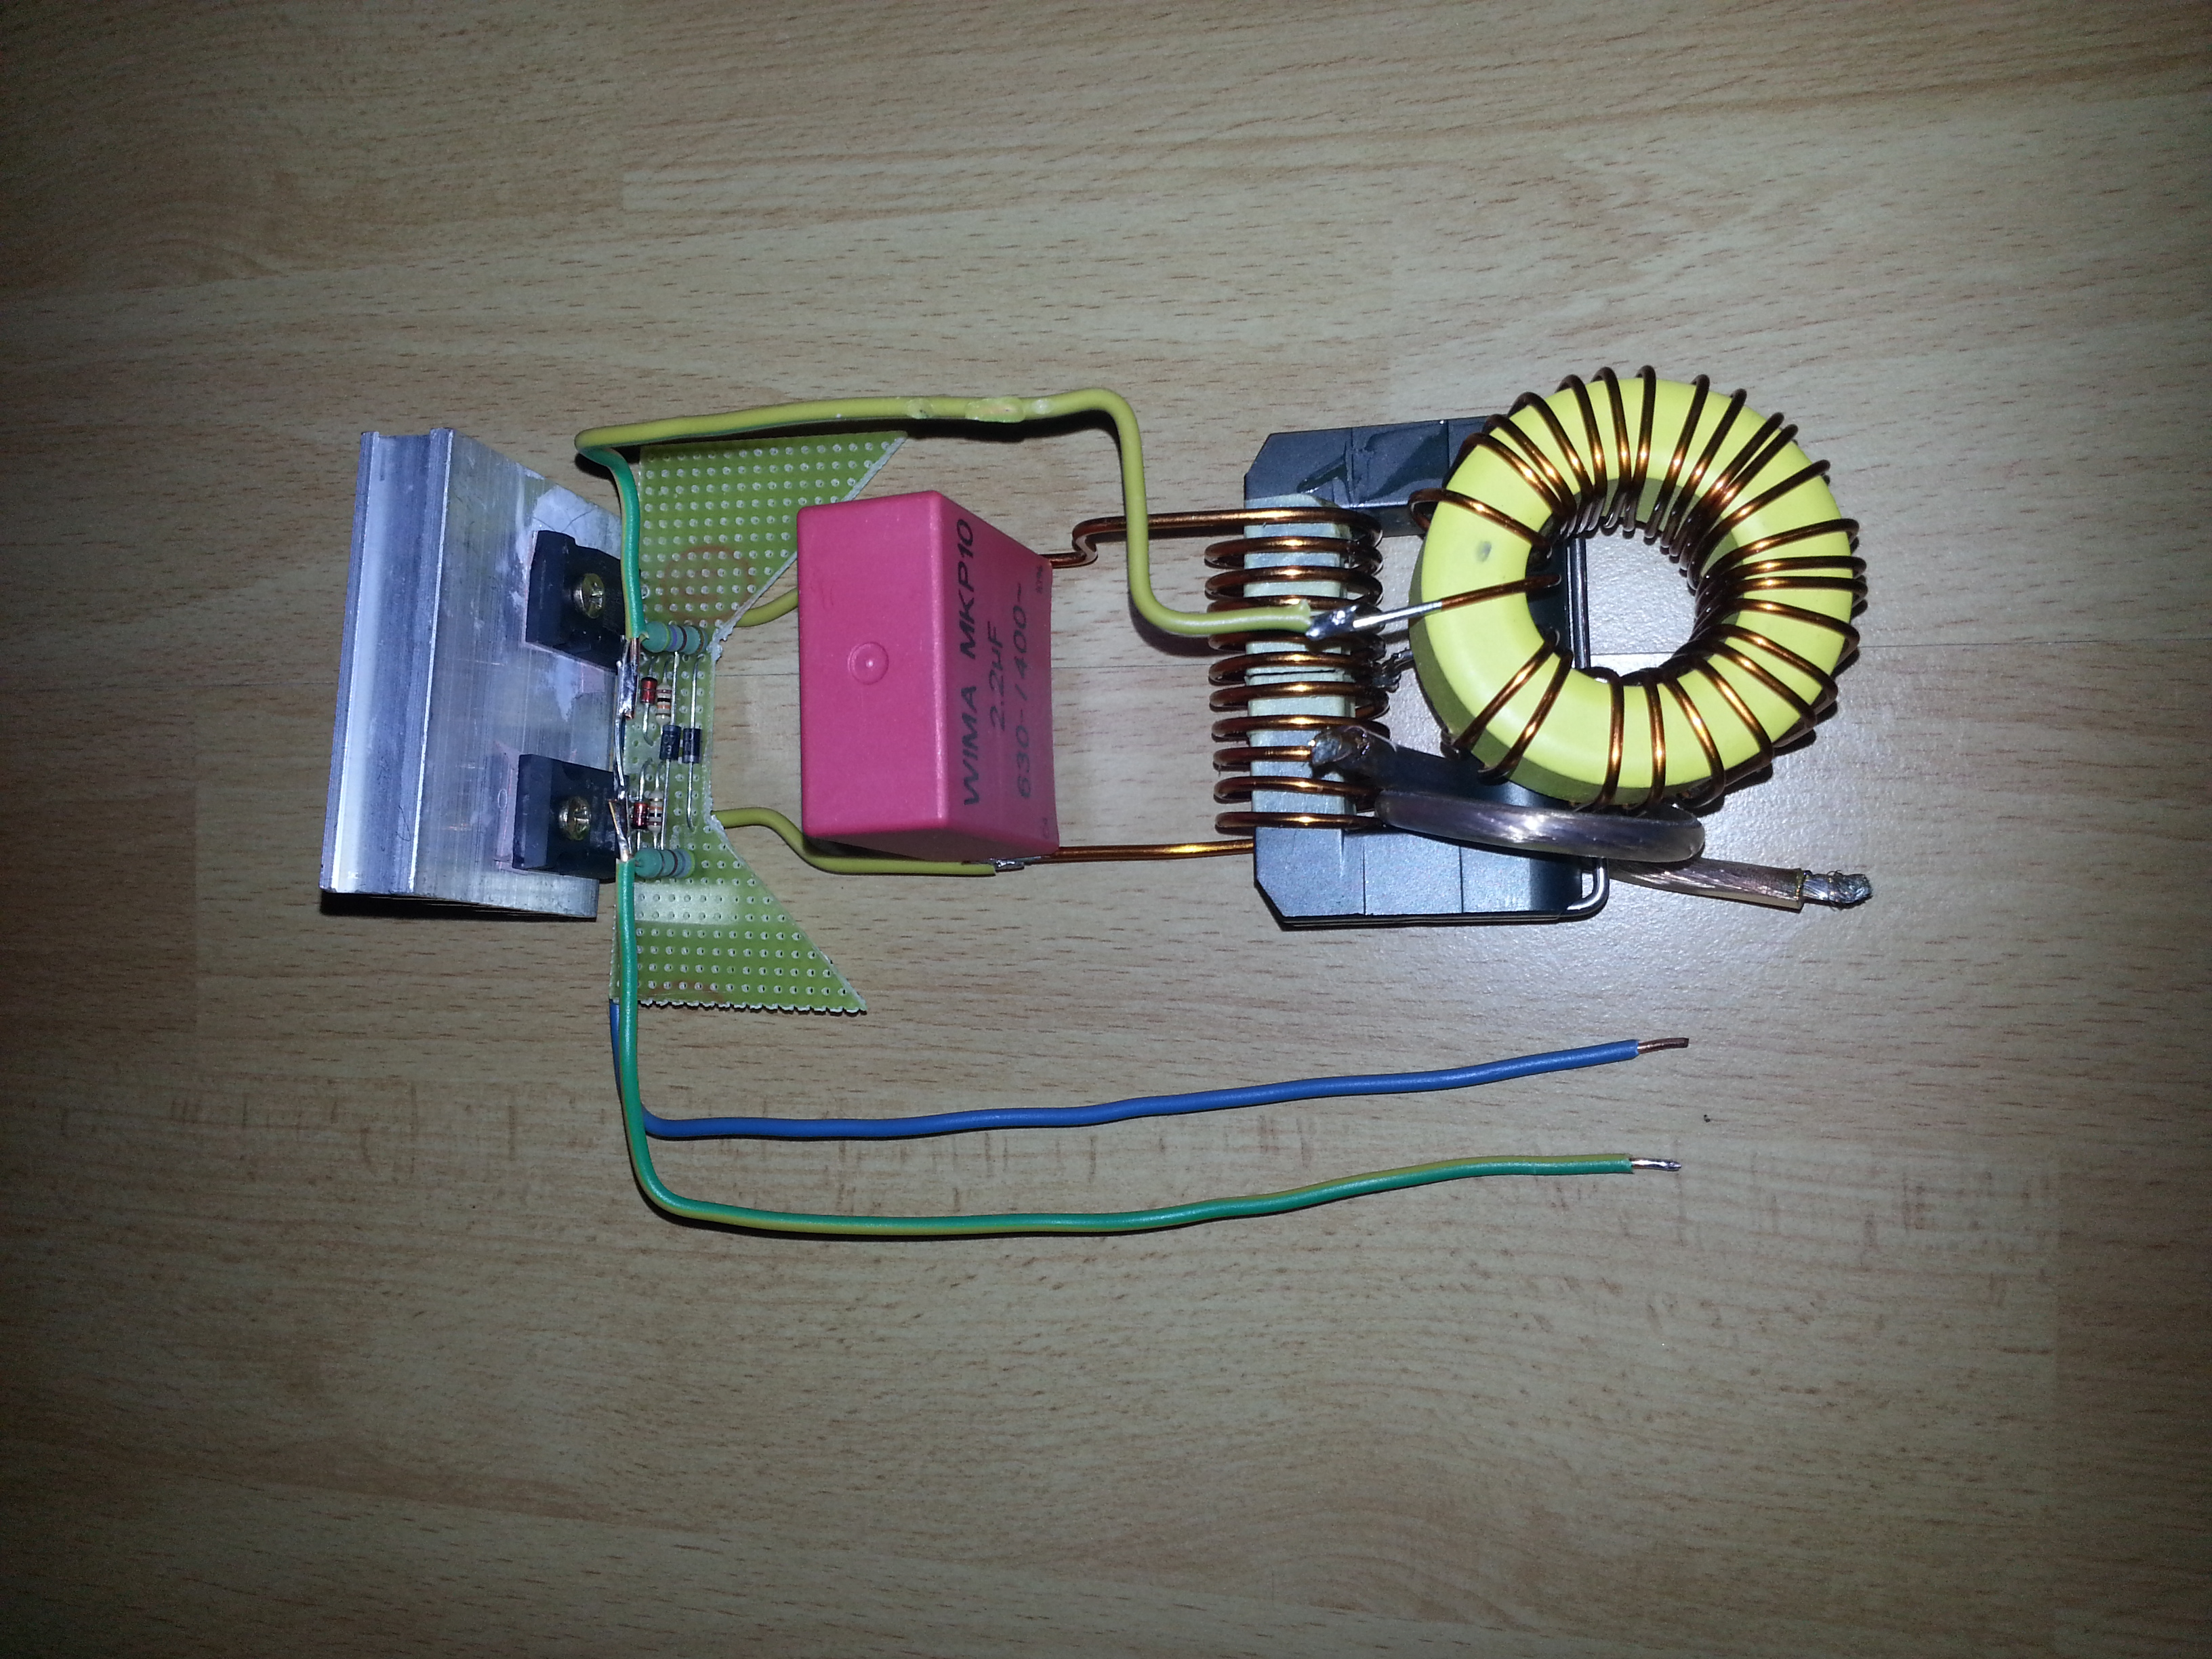 Bigger ZVS Inducton Heater